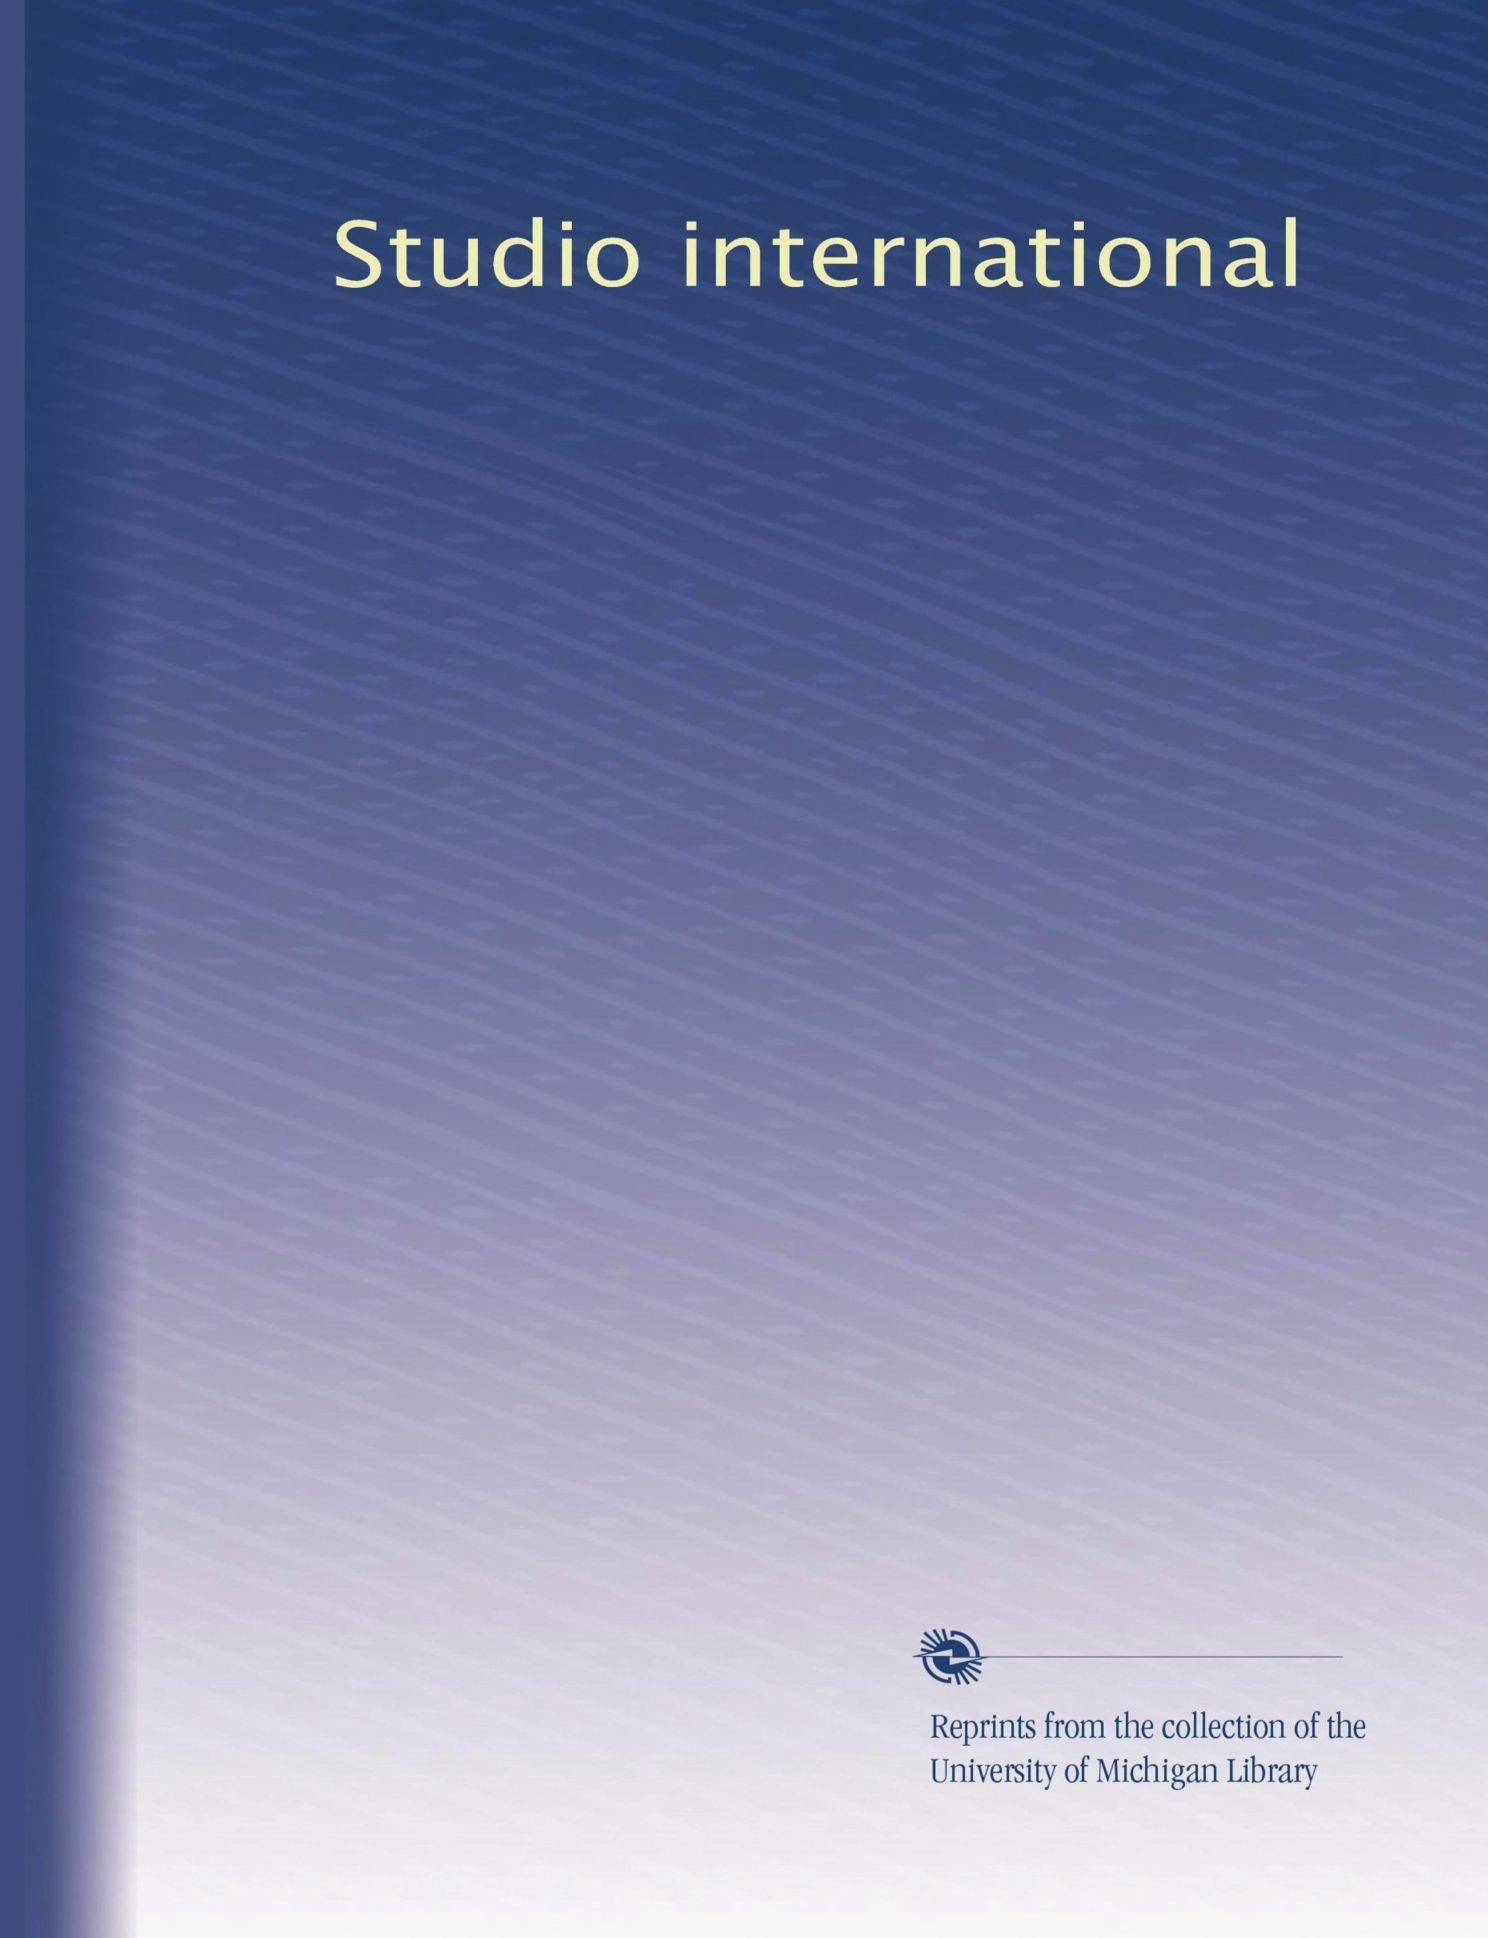 Studio international (Volume 50) pdf